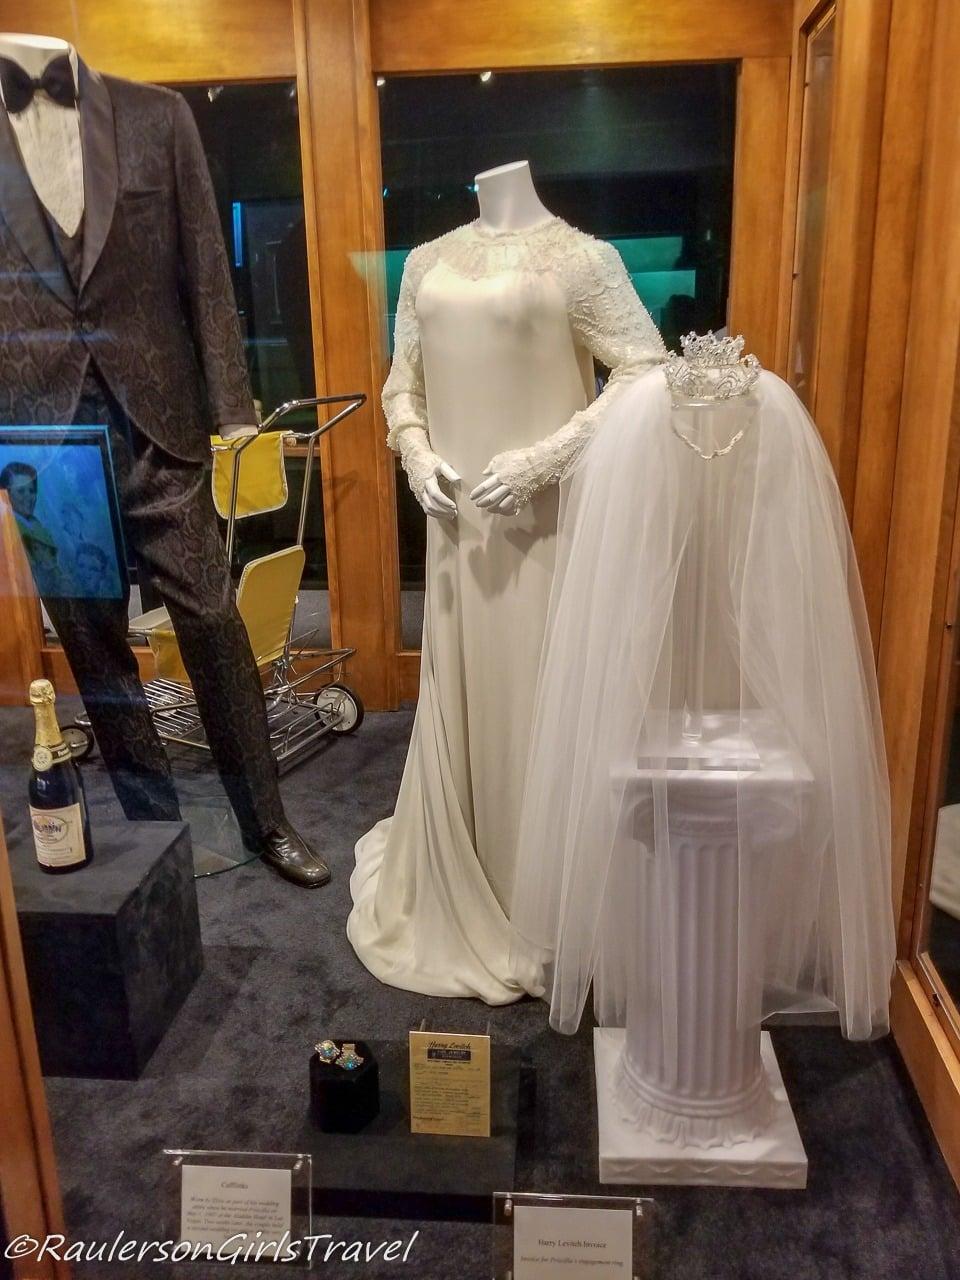 Elvis and Priscilla's Original Wedding Attire